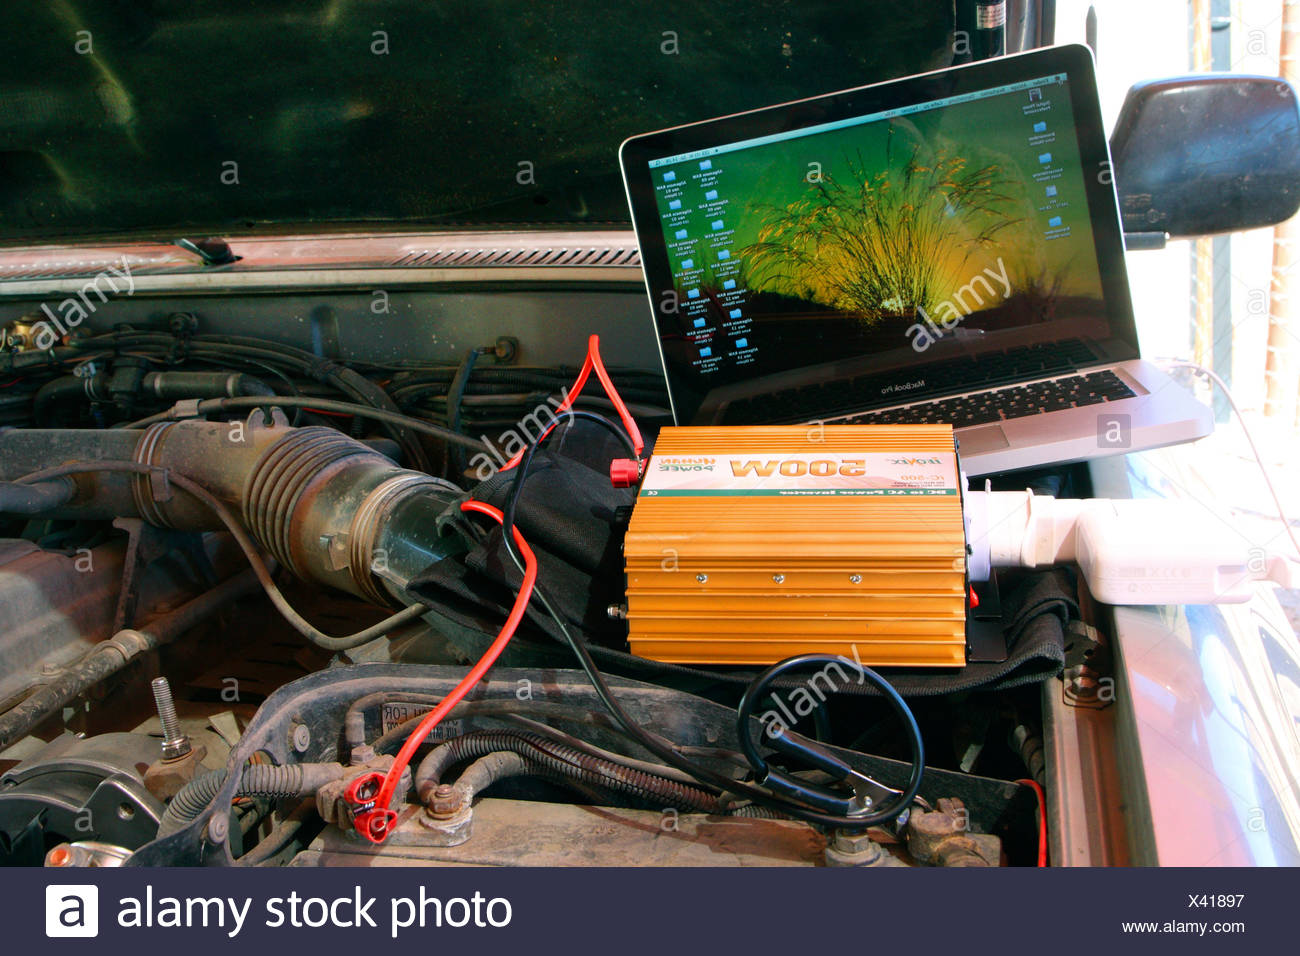 charging a laptop at a car battery in the Kalahari desert, South Africa - Stock Image